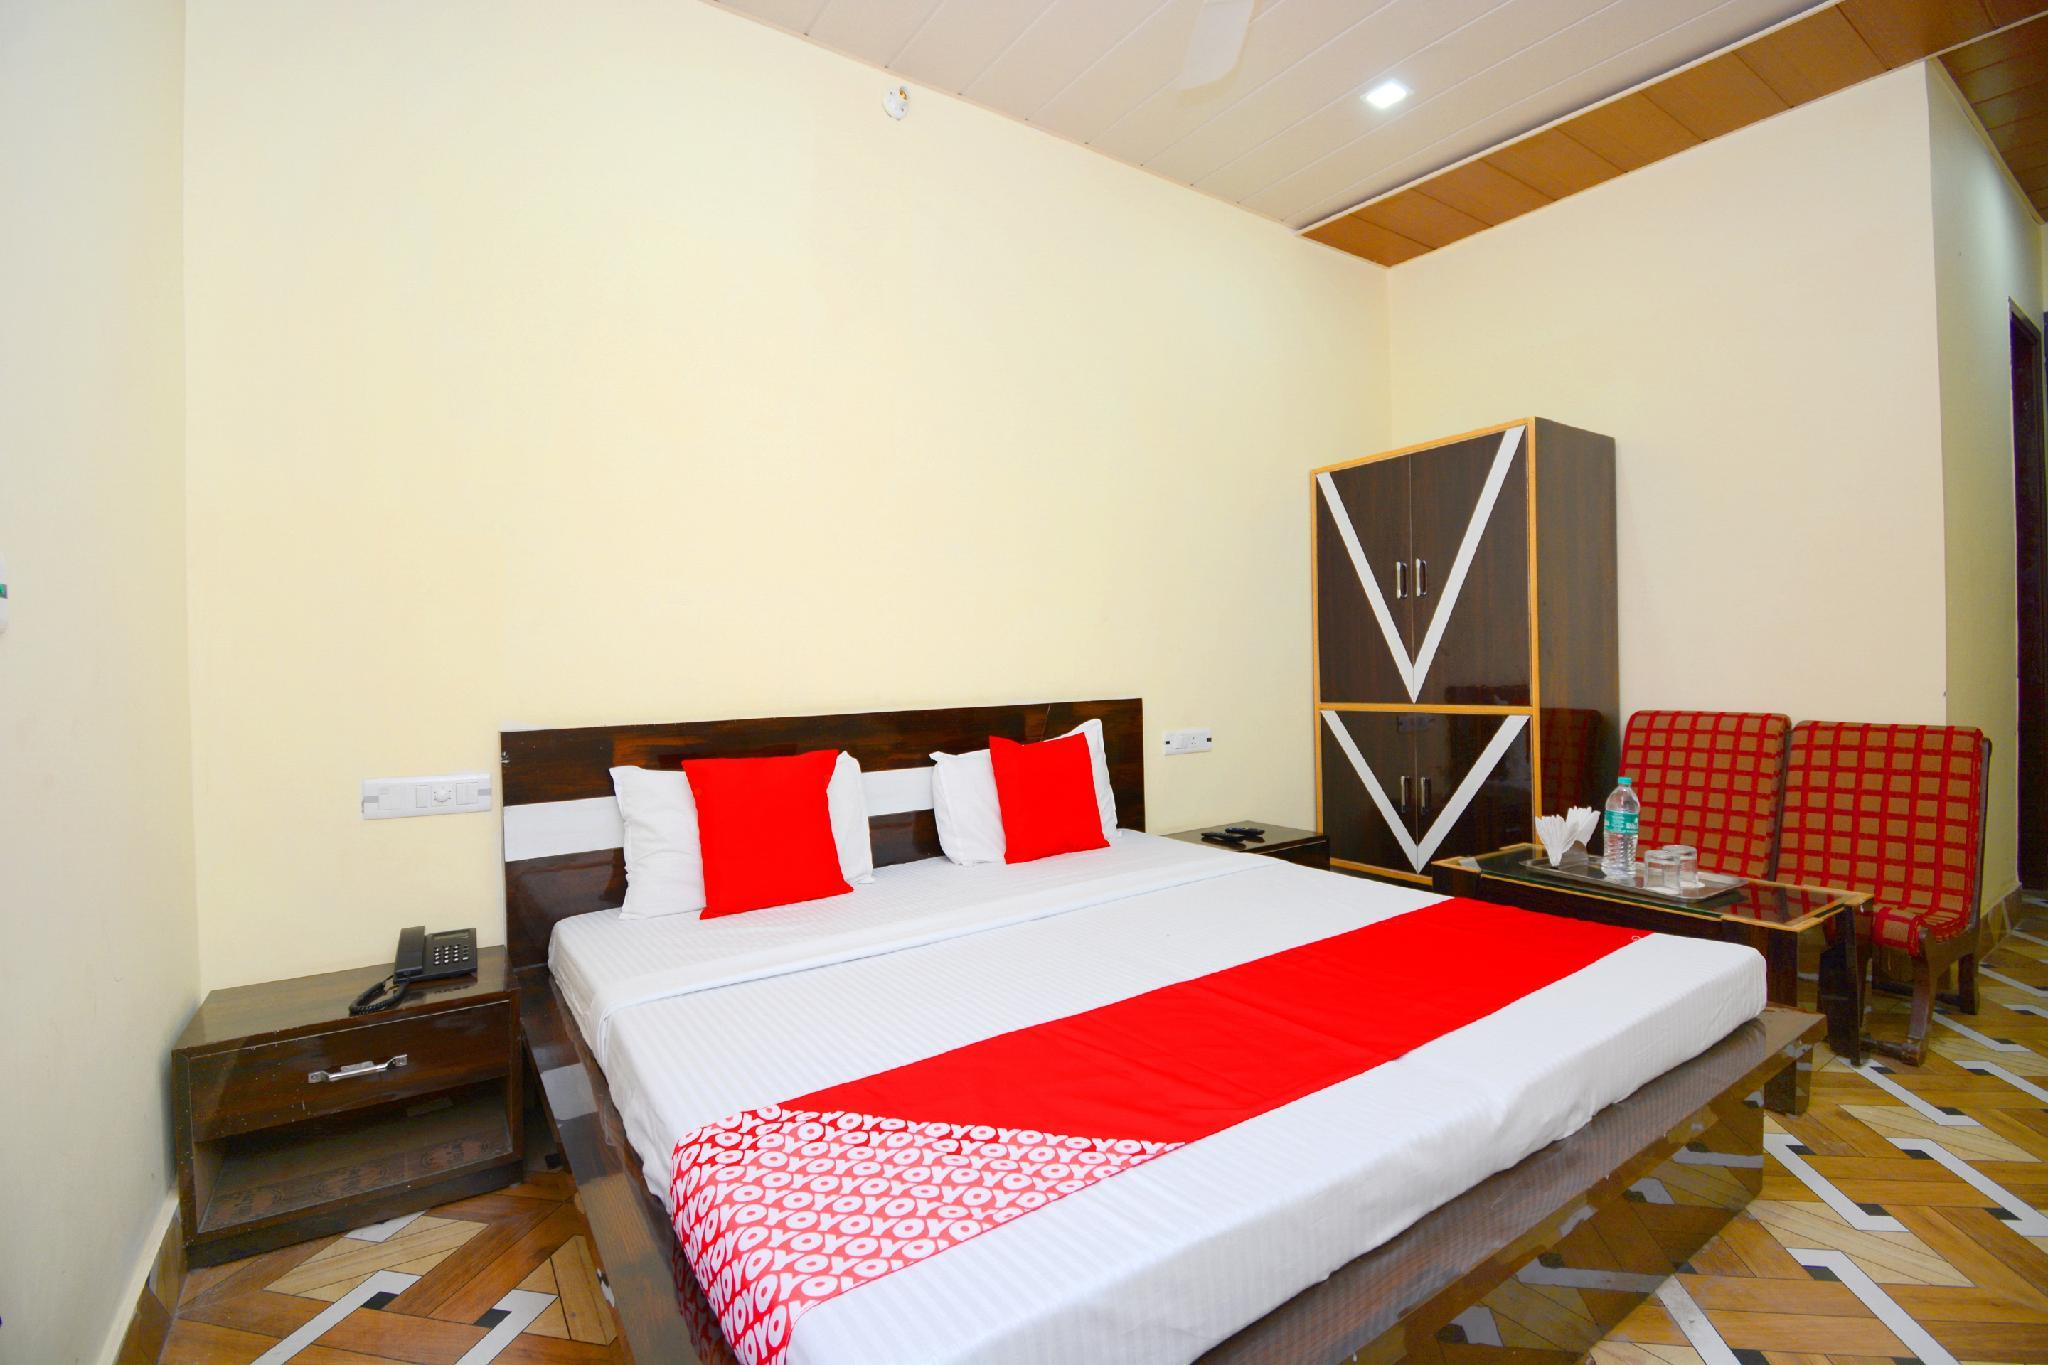 OYO 37902 Kaler Regency, Pathankot